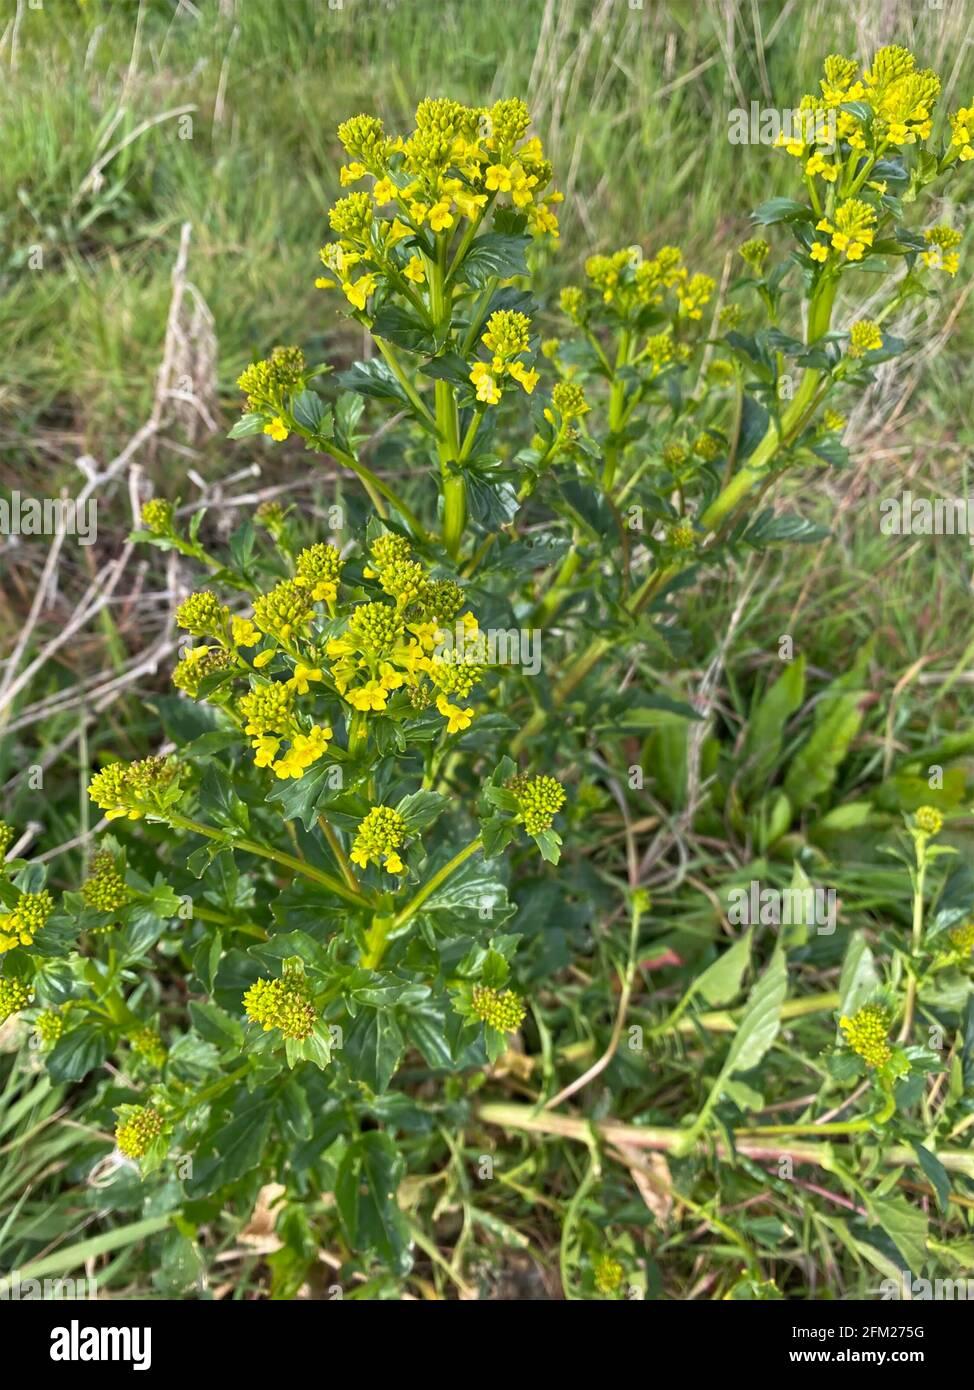 BITTERCRESS  Barbarea vulgaris Biennial herb.Photo: Tony Gale Stock Photo